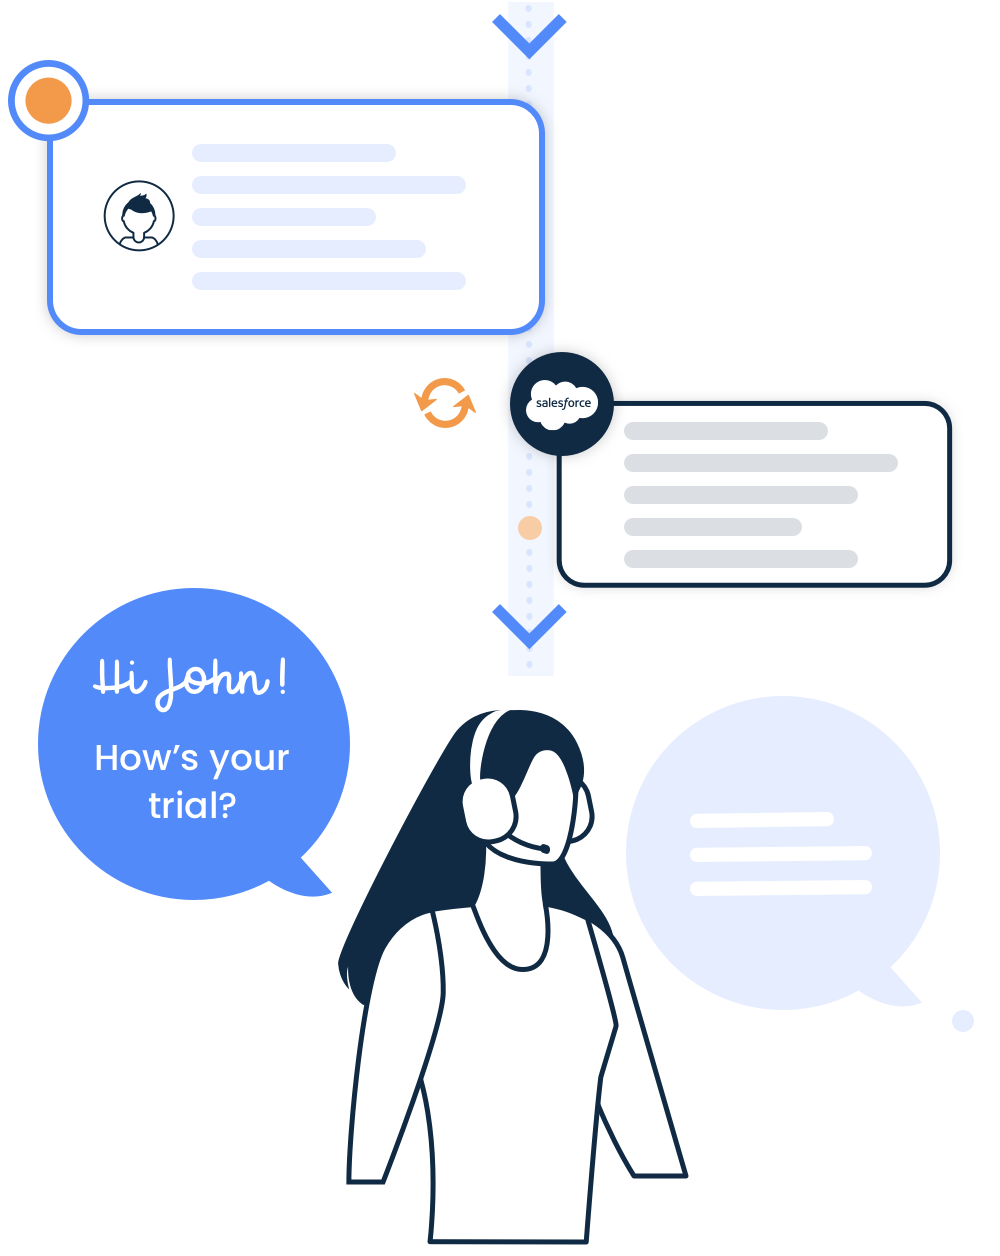 journy.io customer success use case